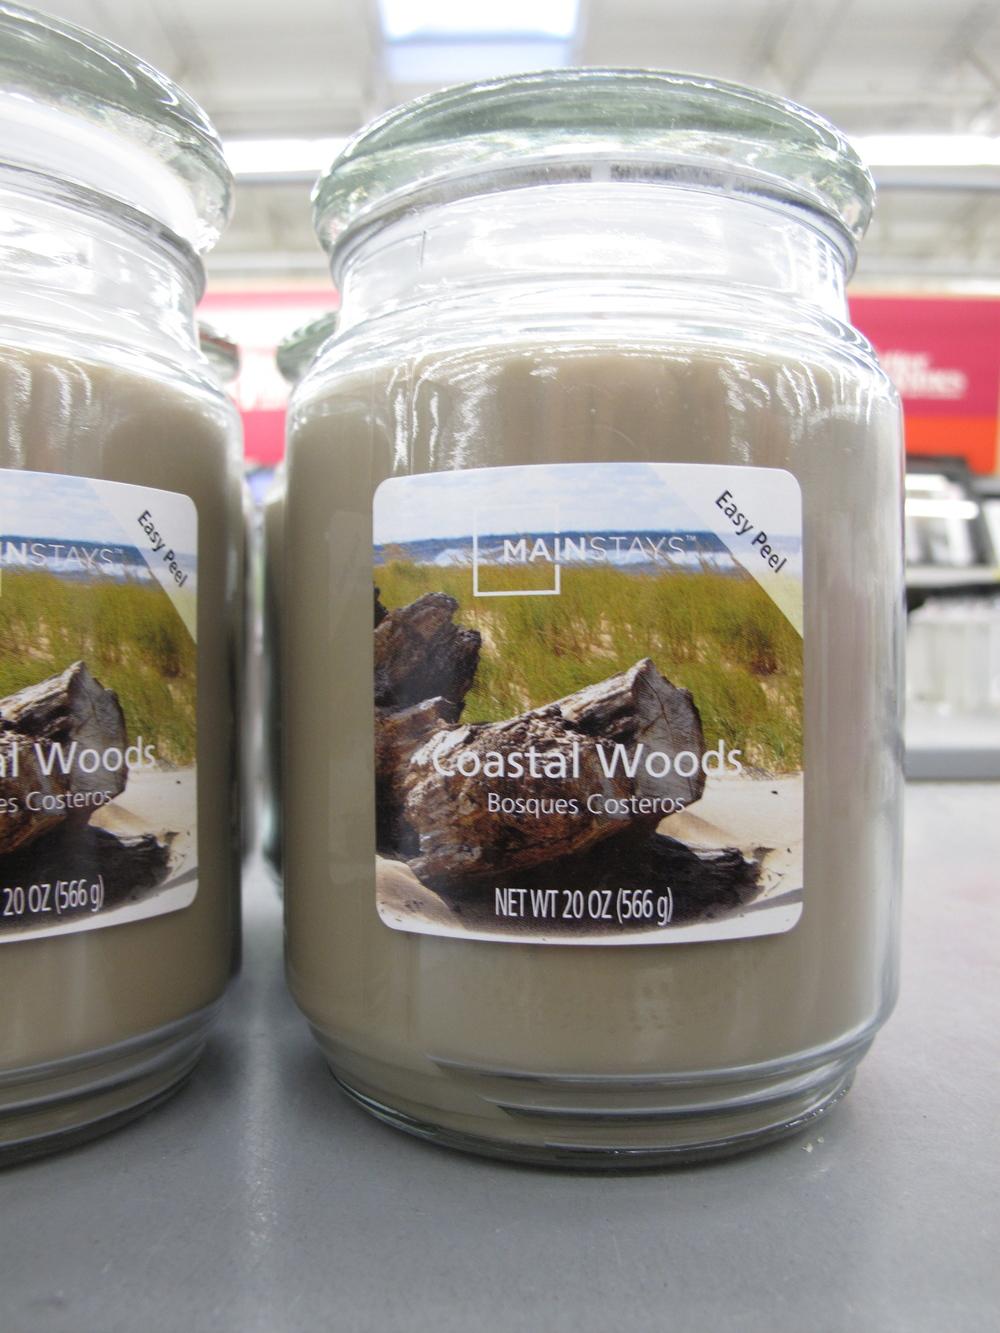 Coastal wood candle at Walmart. Hilarious candle smells.